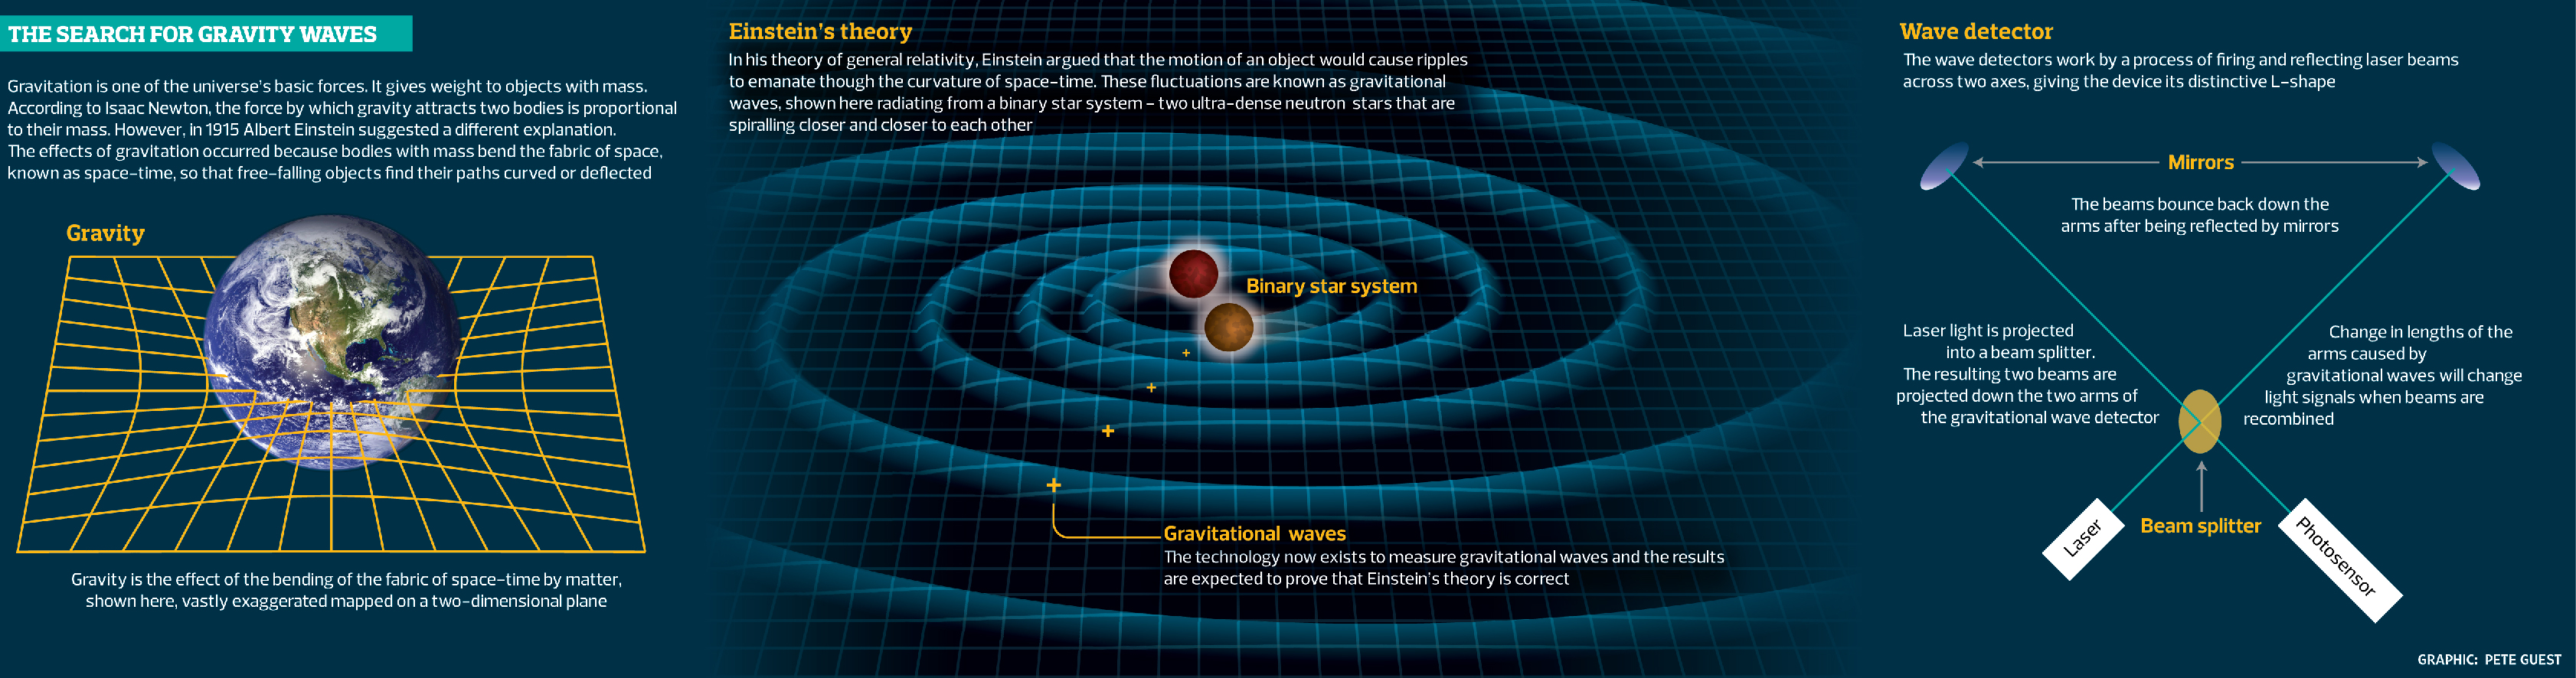 Gravitational waves explained. image: the guardian